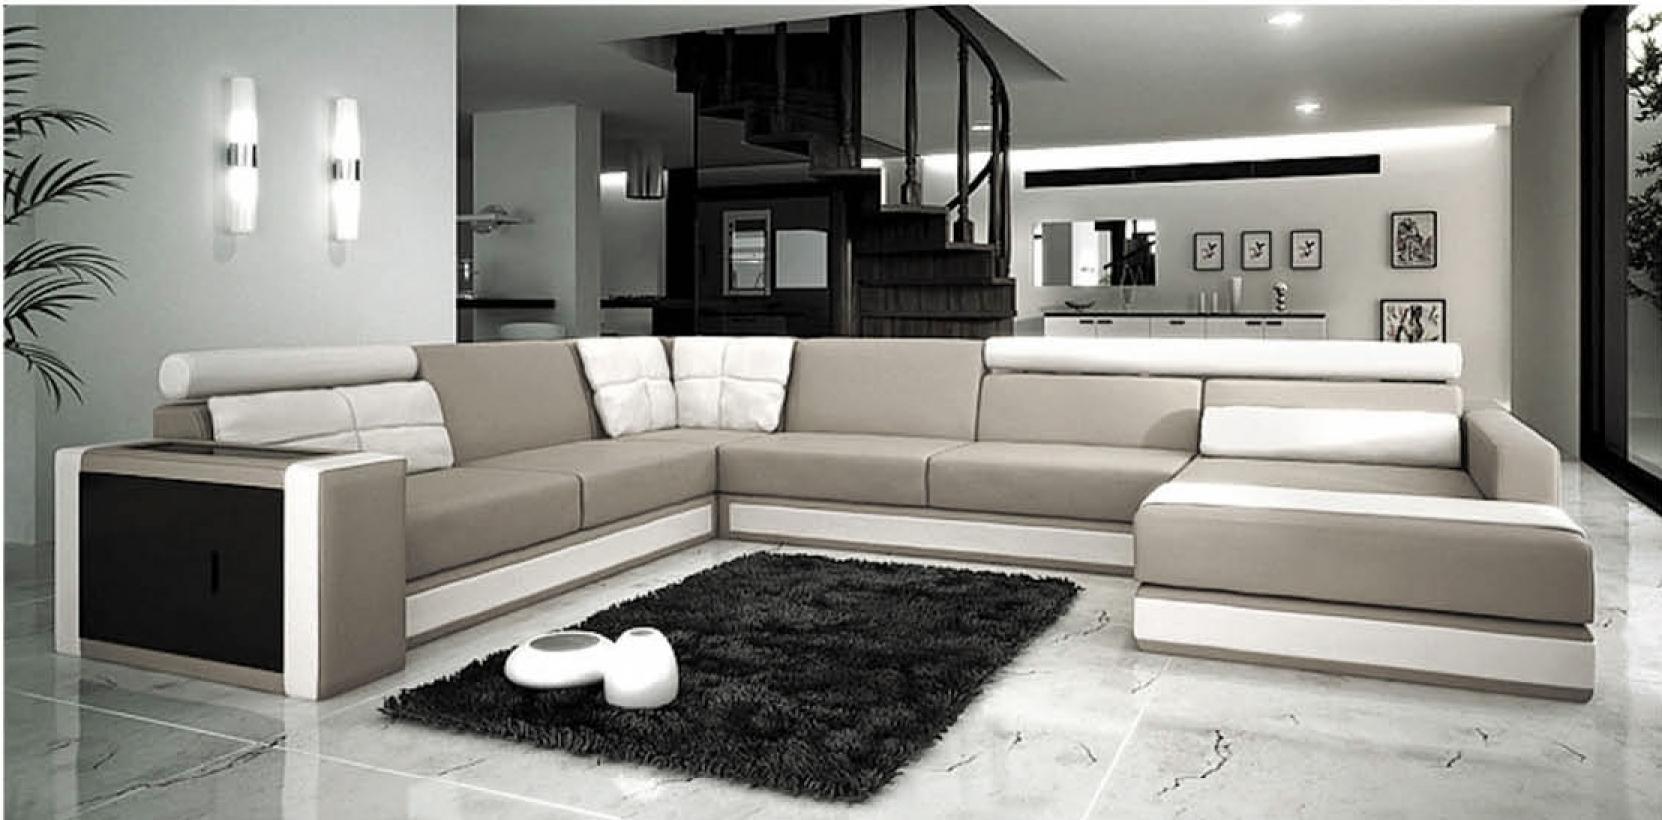 photos canap italien. Black Bedroom Furniture Sets. Home Design Ideas